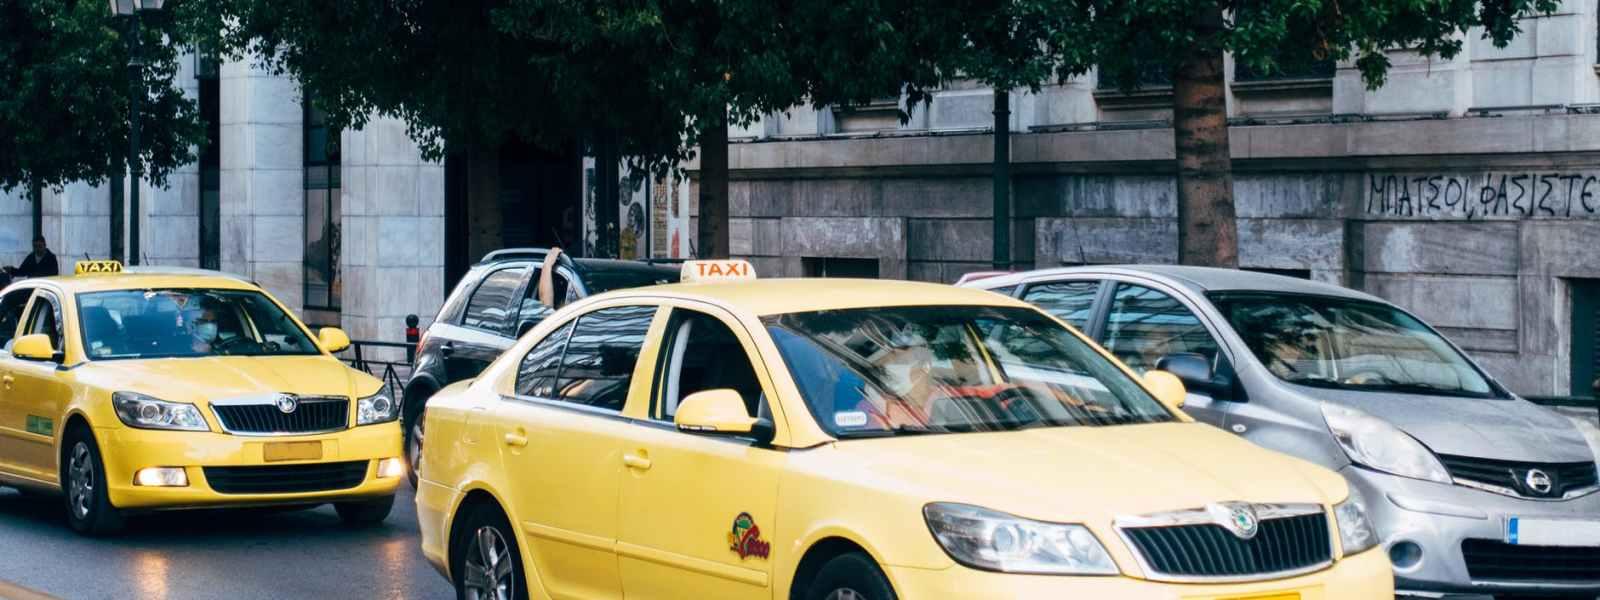 road traffic street yellow